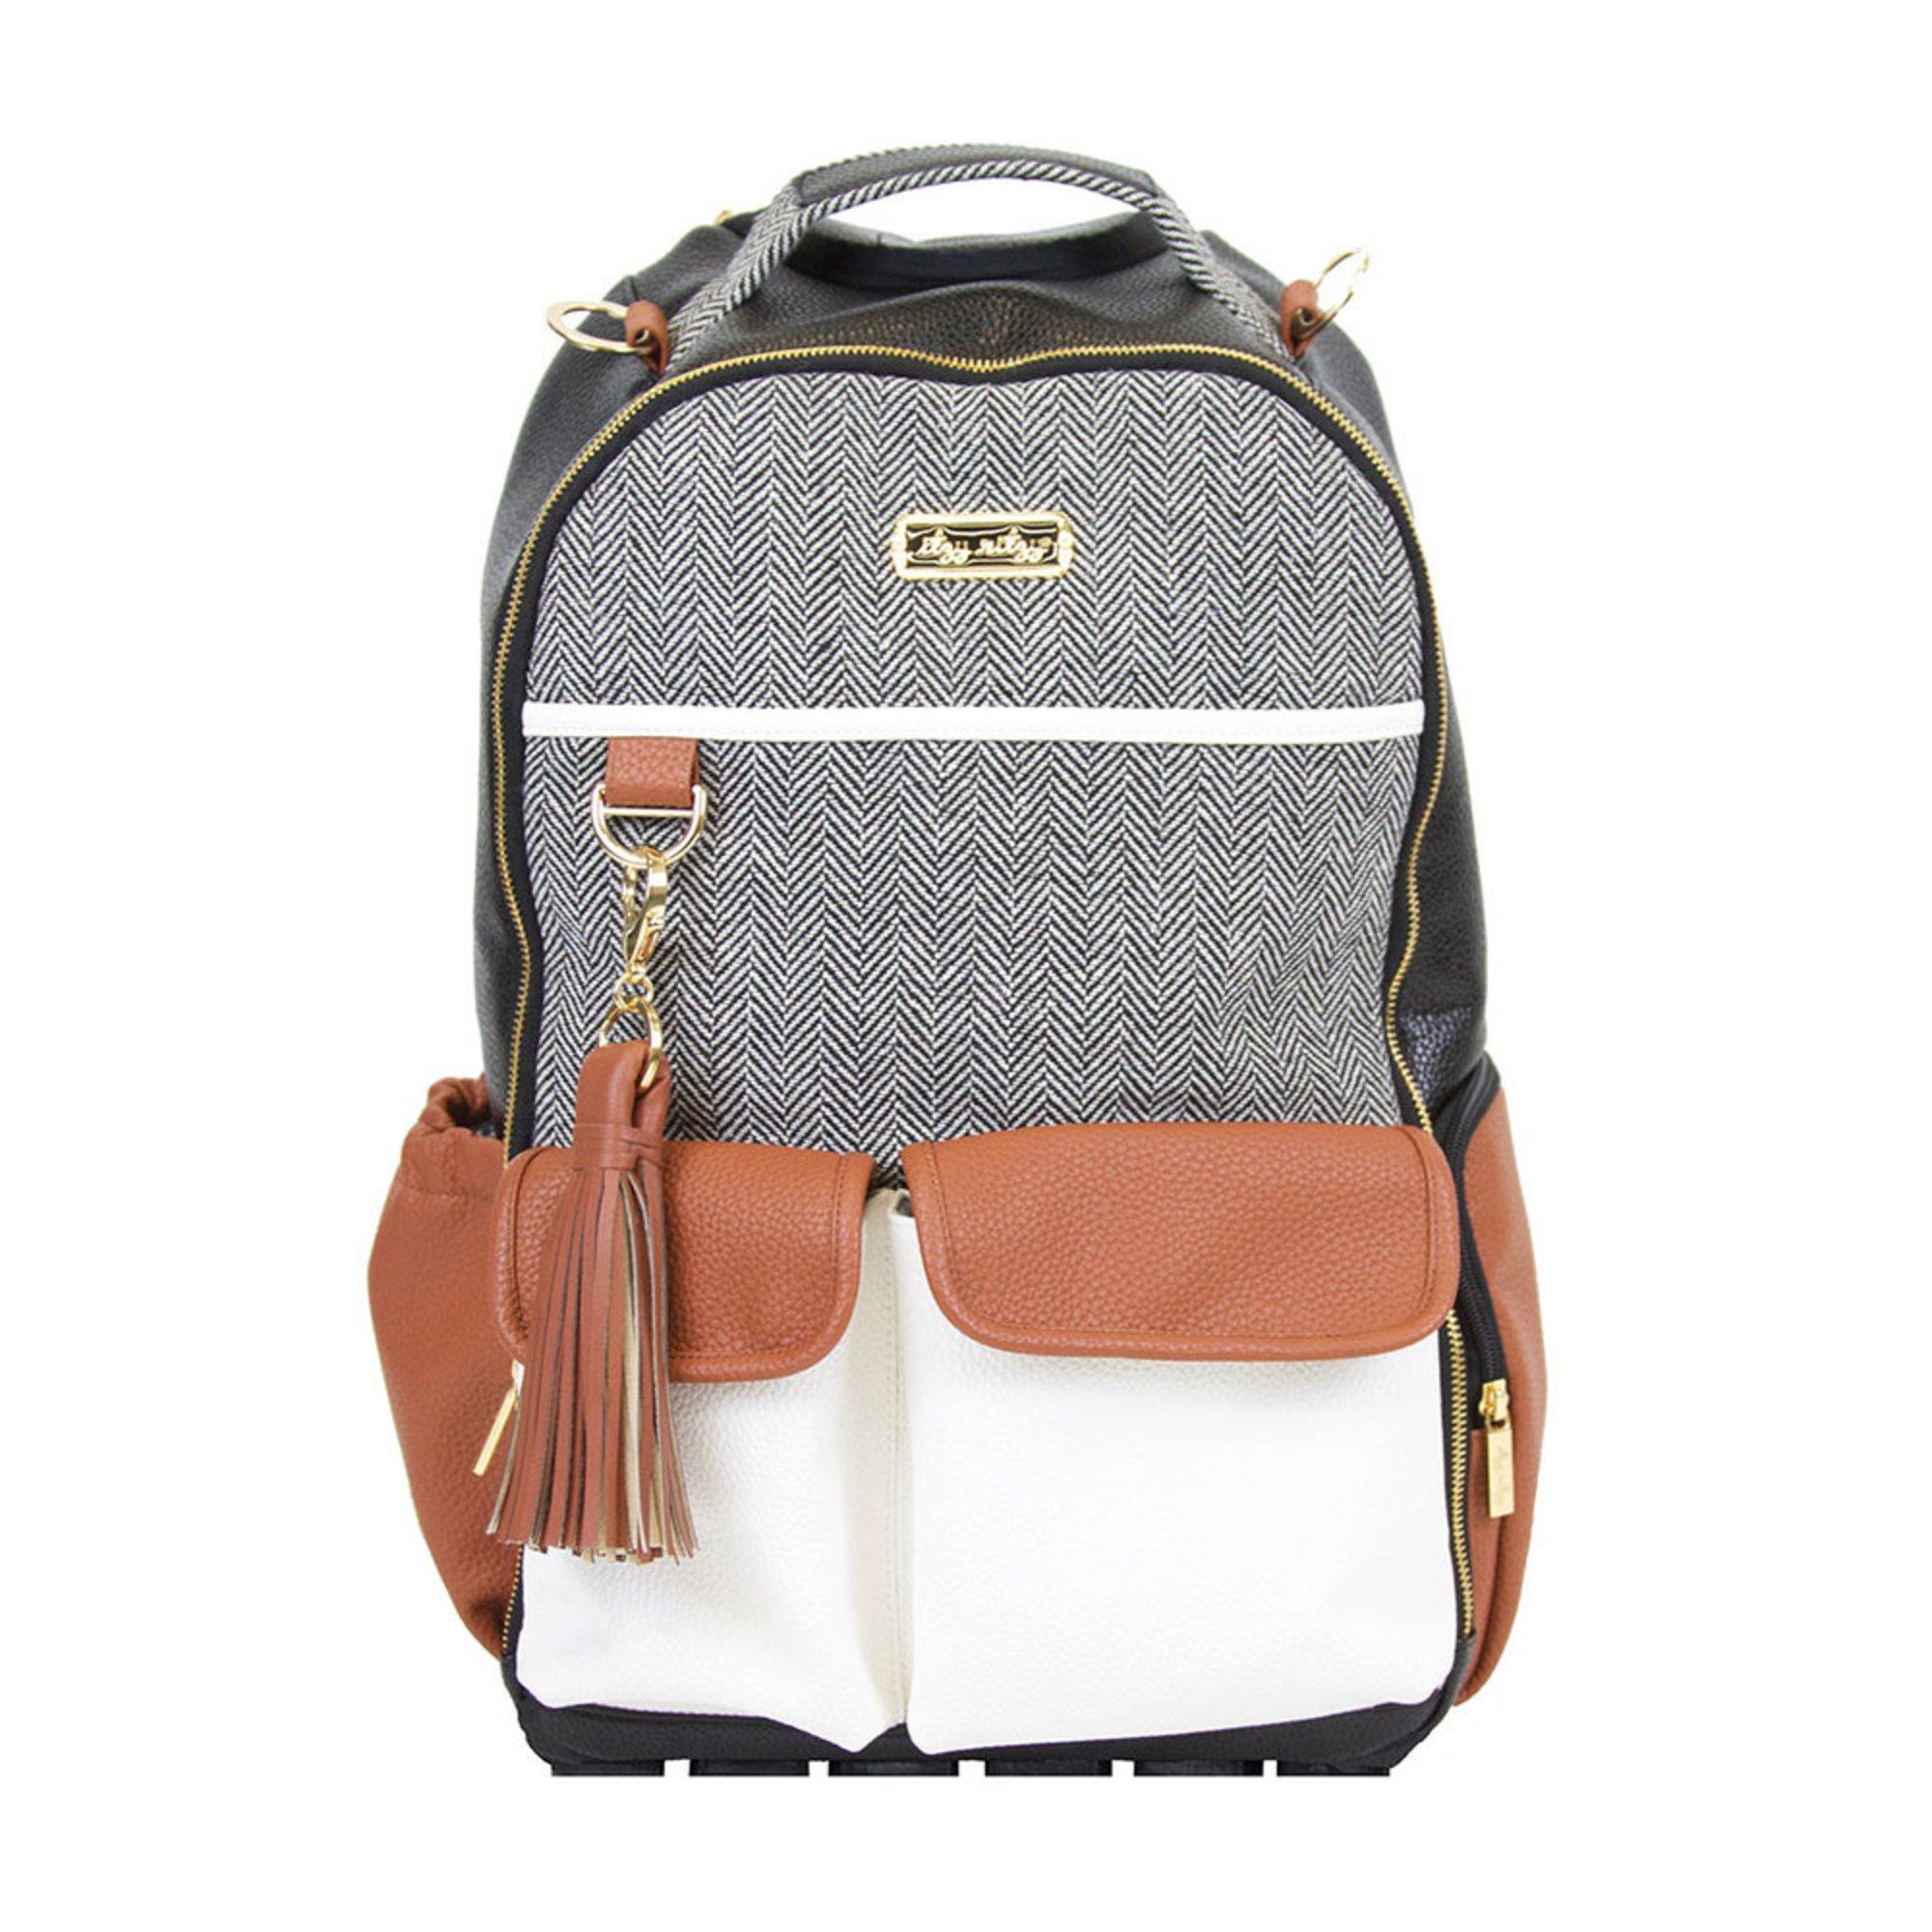 4a43538d7be Itzy Ritzy. Itzy Ritzy Boss Backpack Diaper Bag